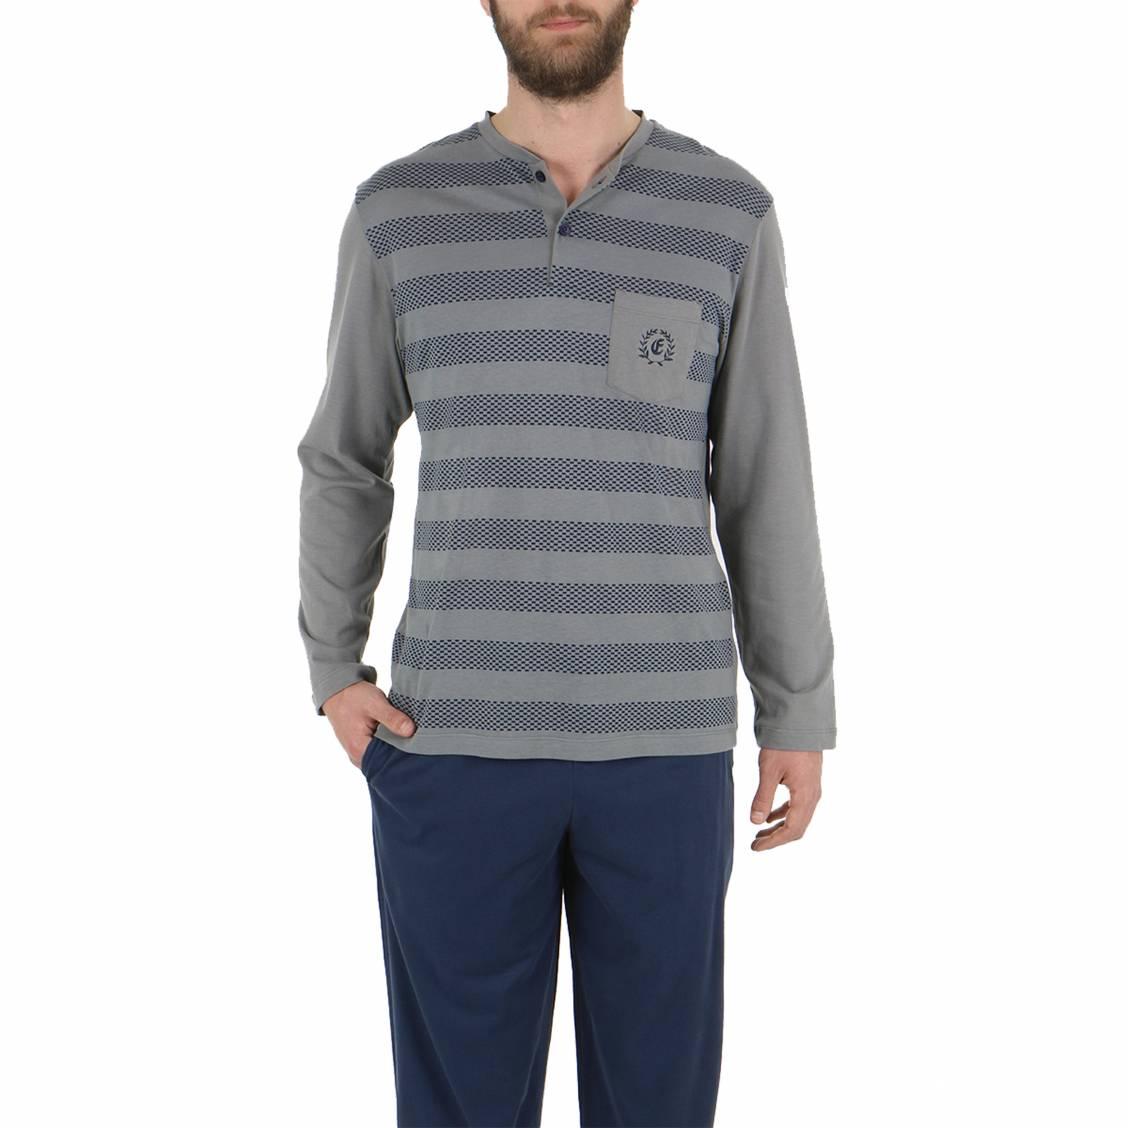 Pyjama long Eminence en jersey de coton gratté : tee-shirt col tunisien gris à rayures effet tiret bleu marine, pantalon bleu marine